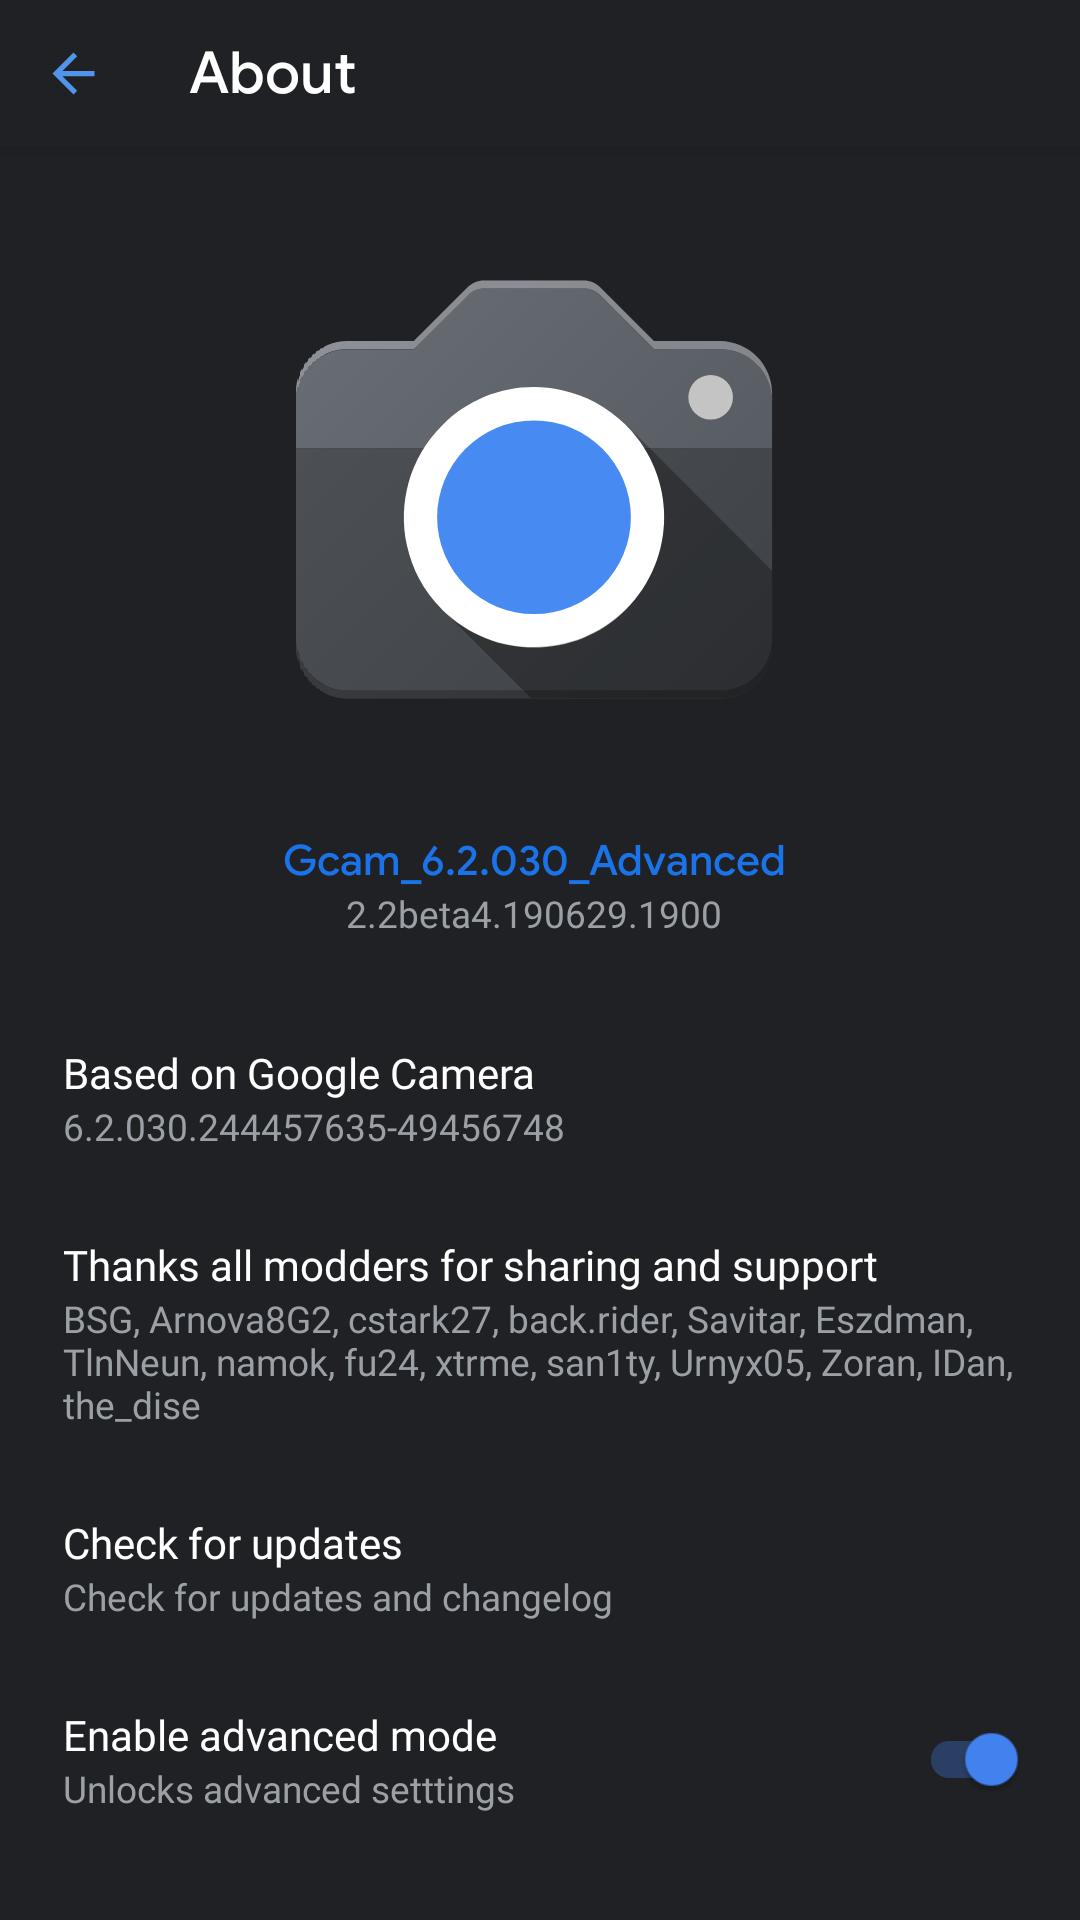 screenshot_20190630-002012_camera.png